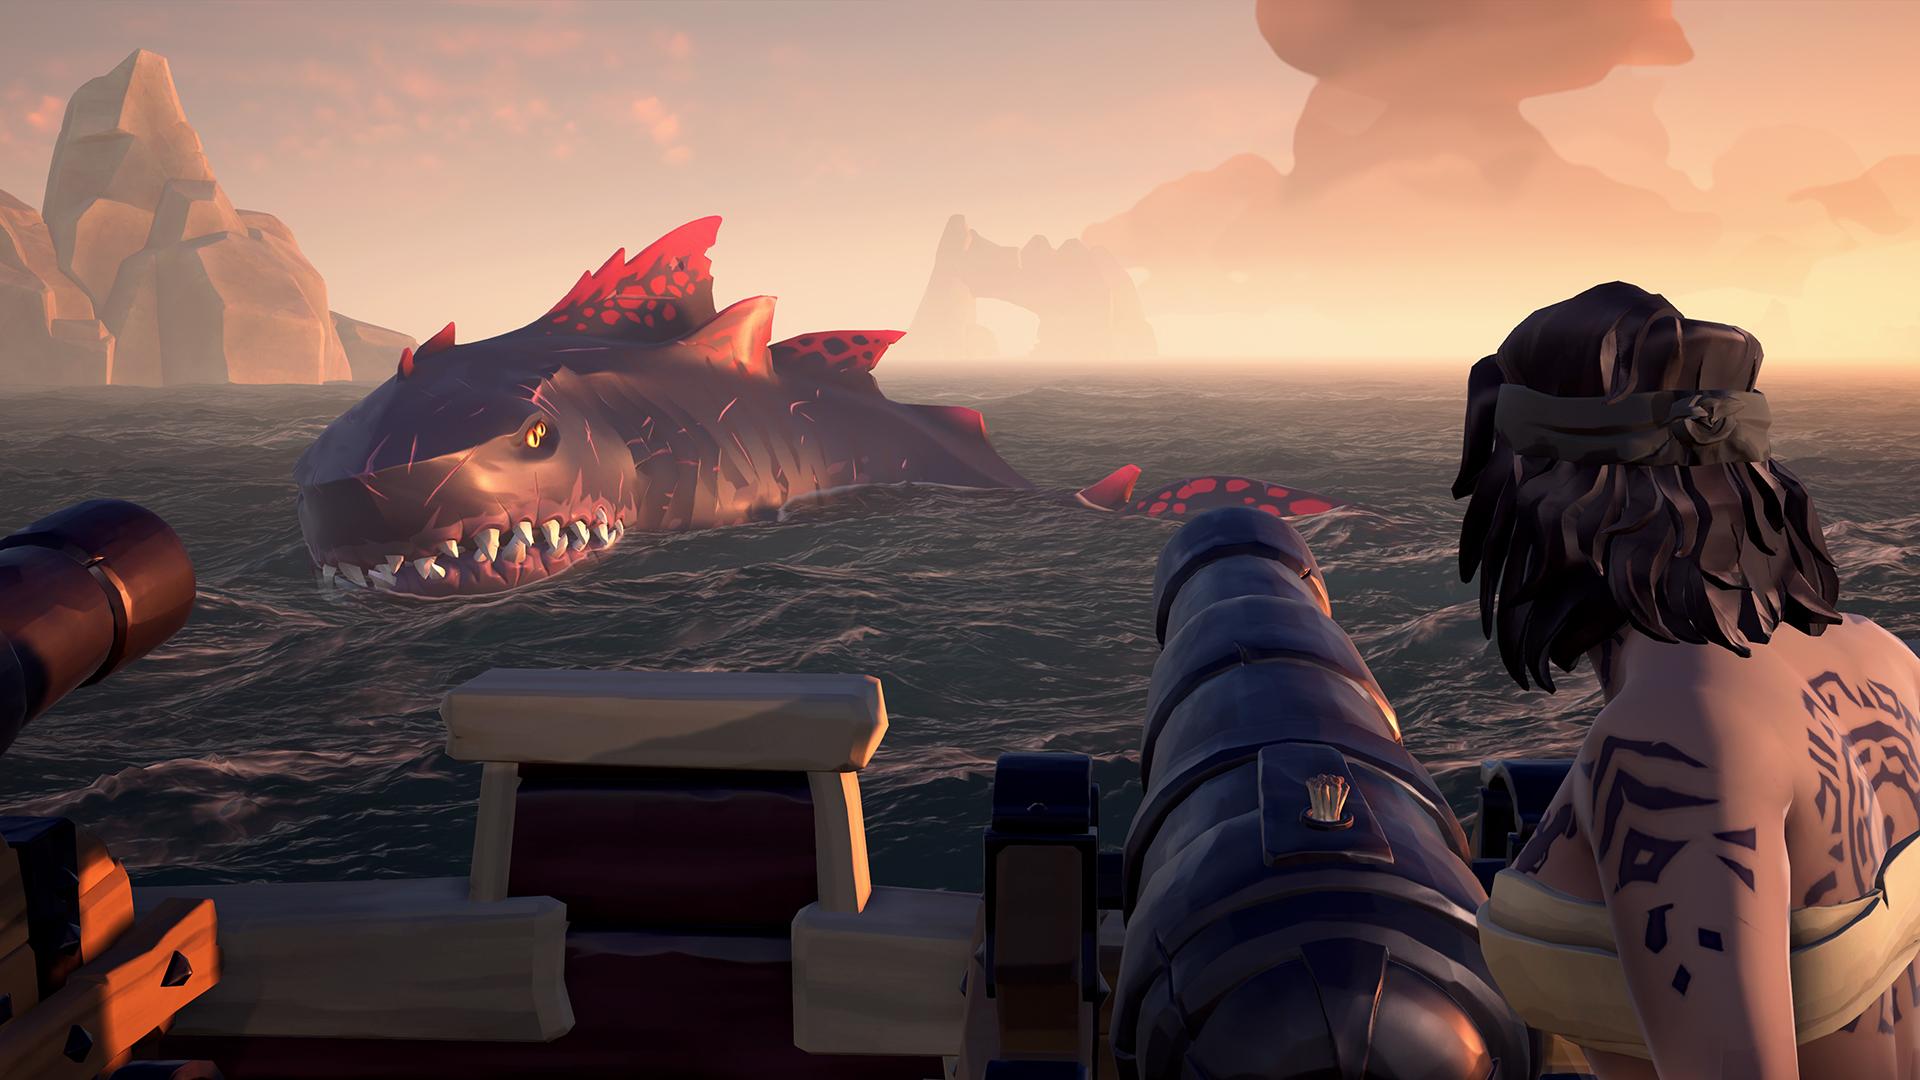 Sea of Thieves launching 'friends play free' promo screenshot